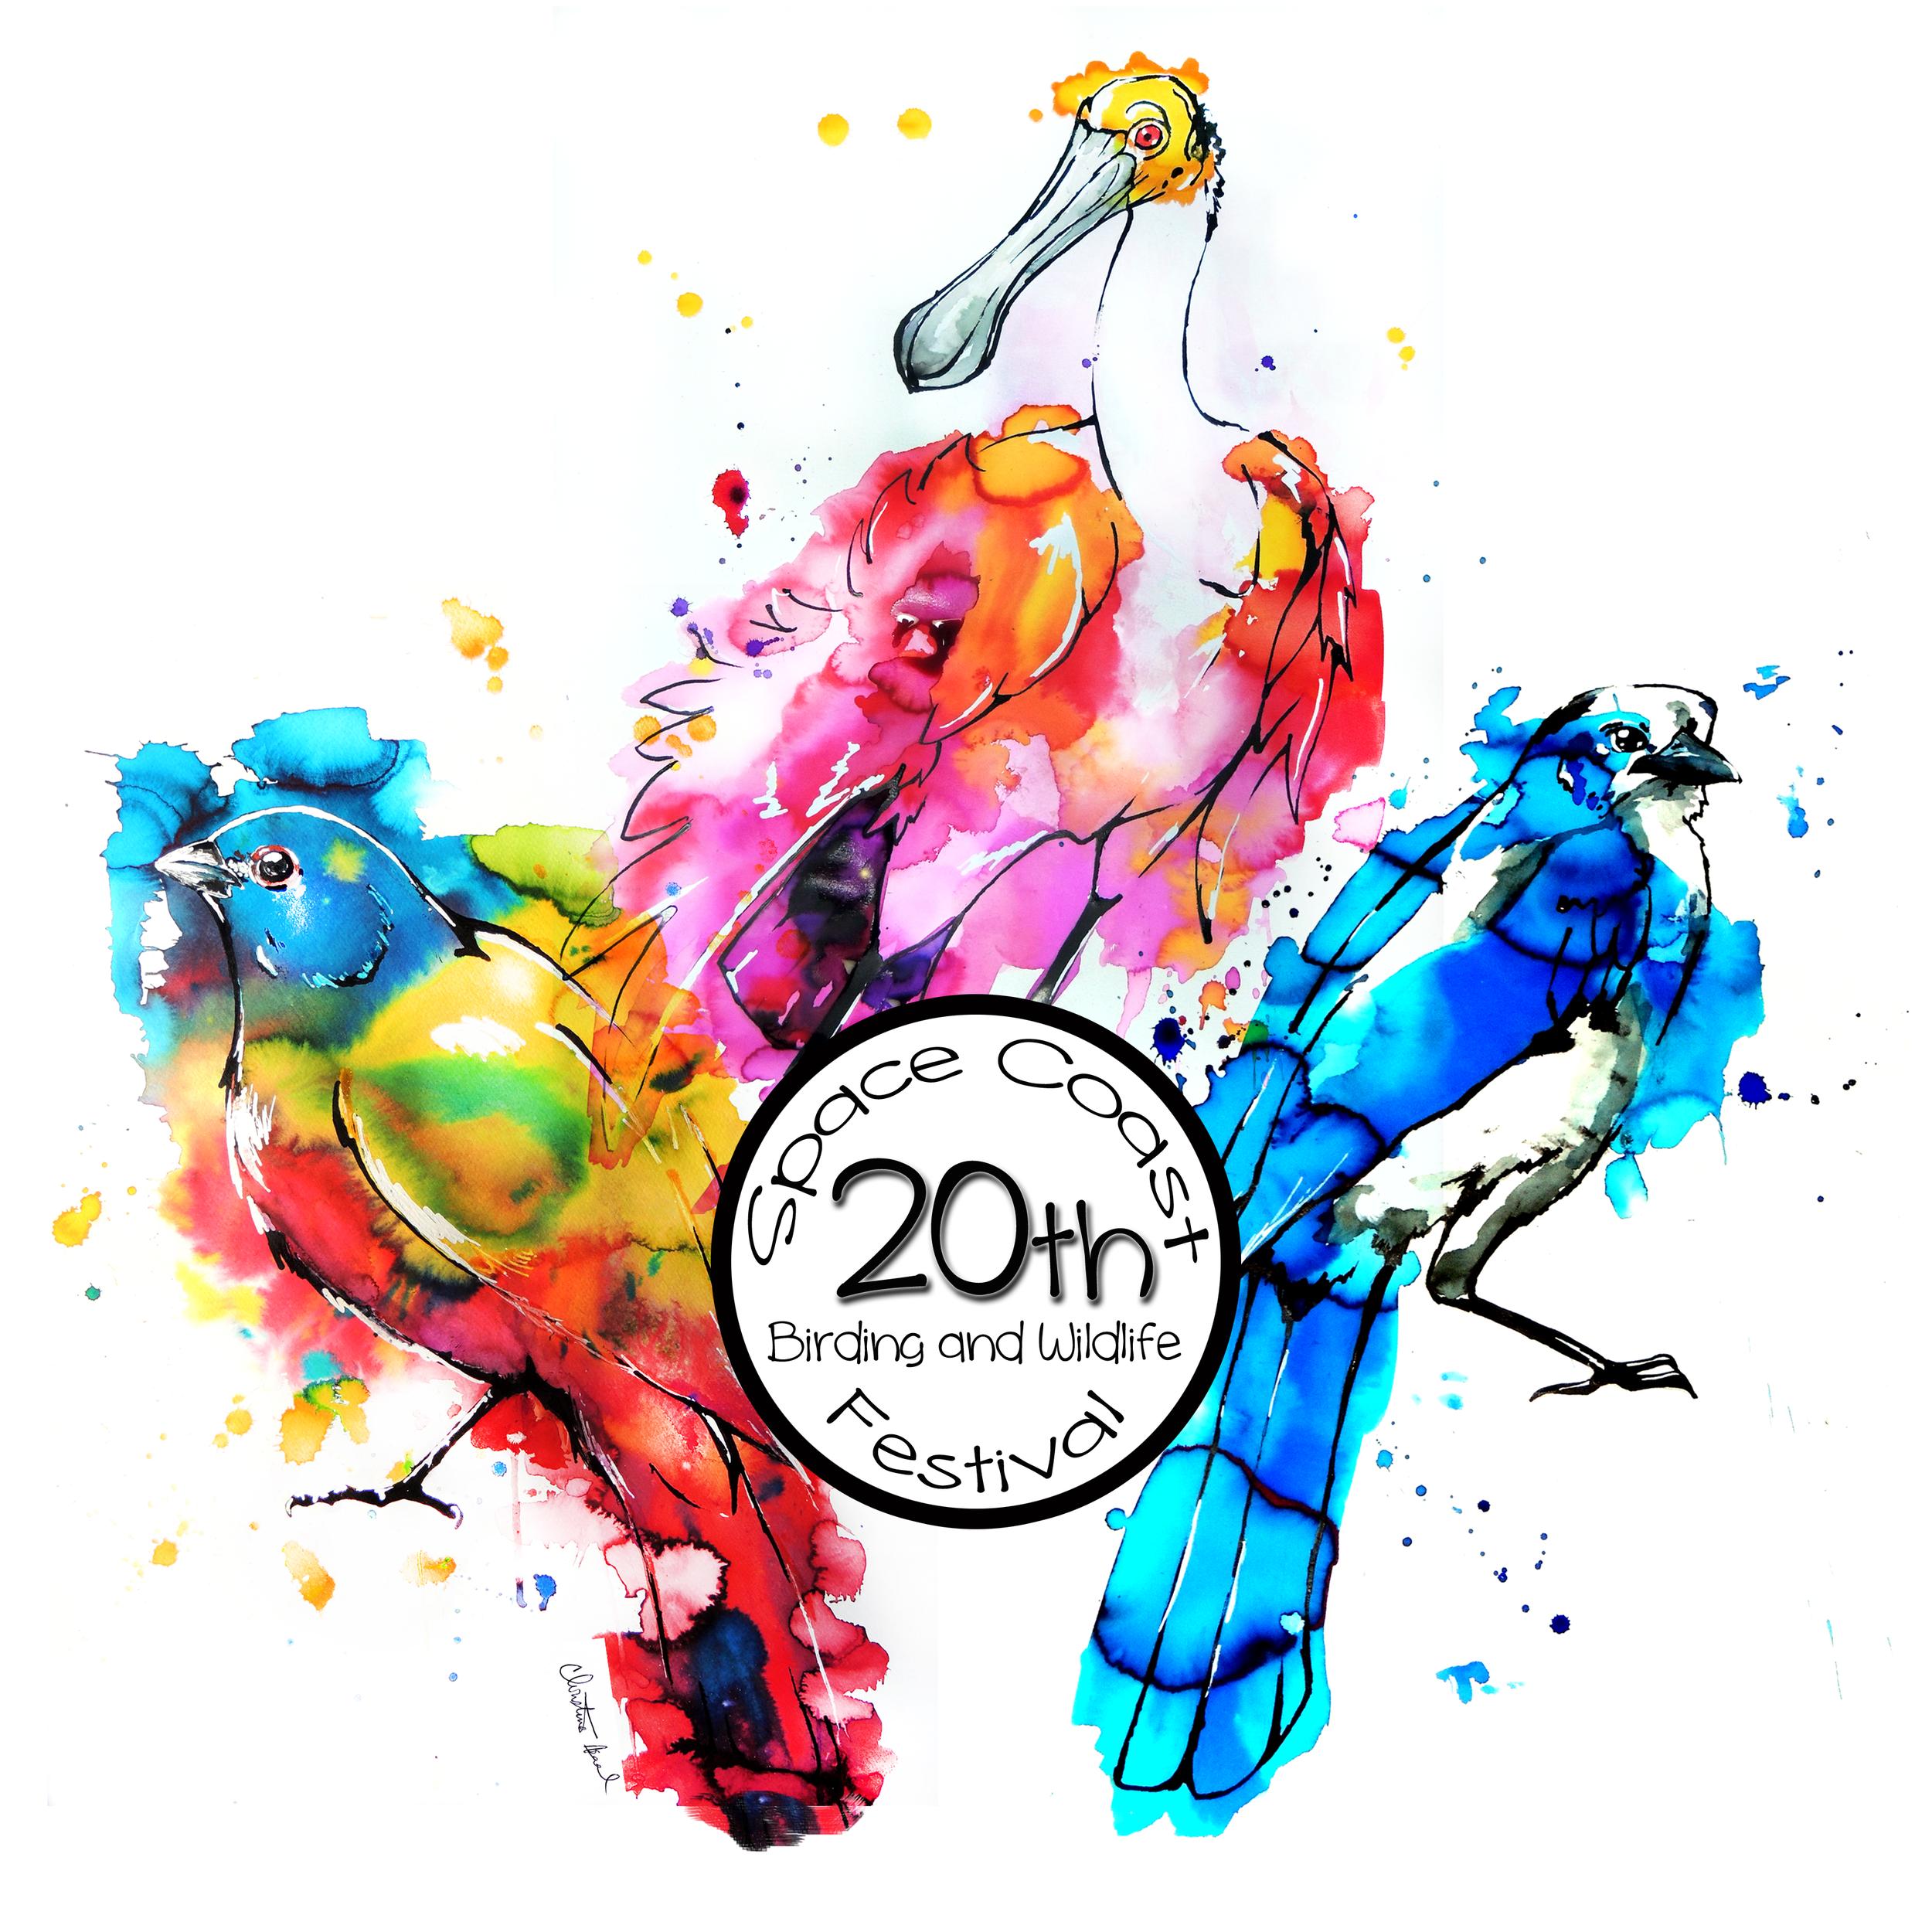 20th Space Coast Birding and Wildlife Festival